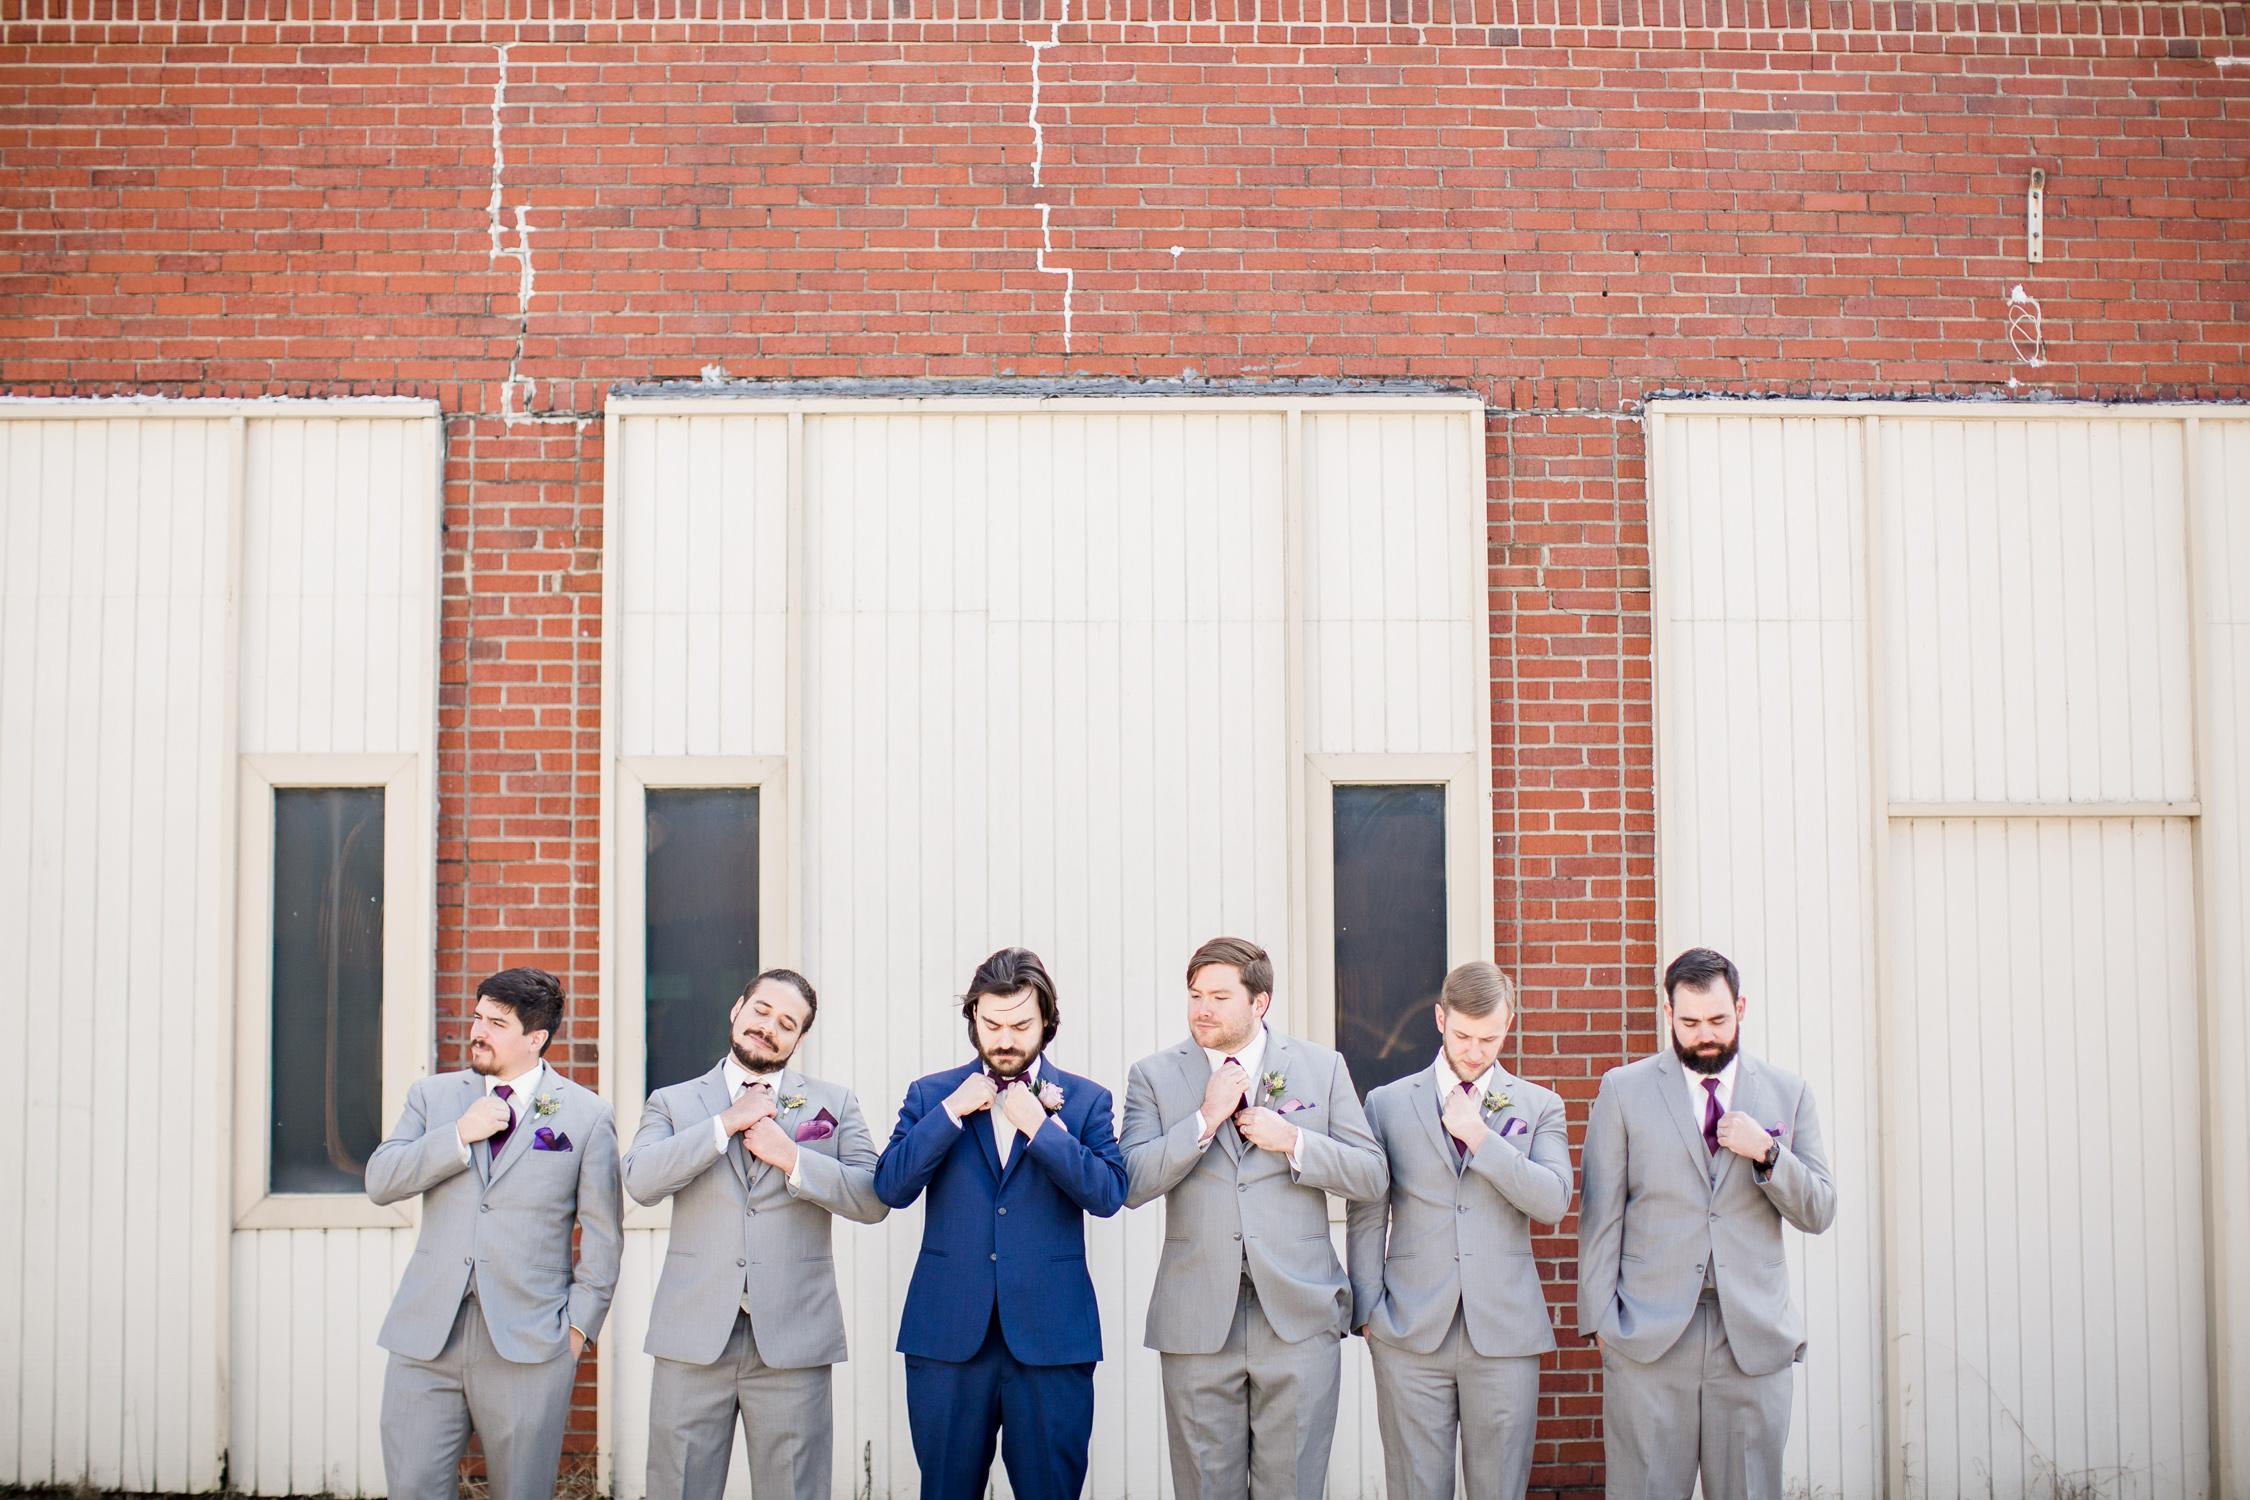 Downtown Knoxville Wedding Venue // Central Avenue Reception // Groomsmen Portraits